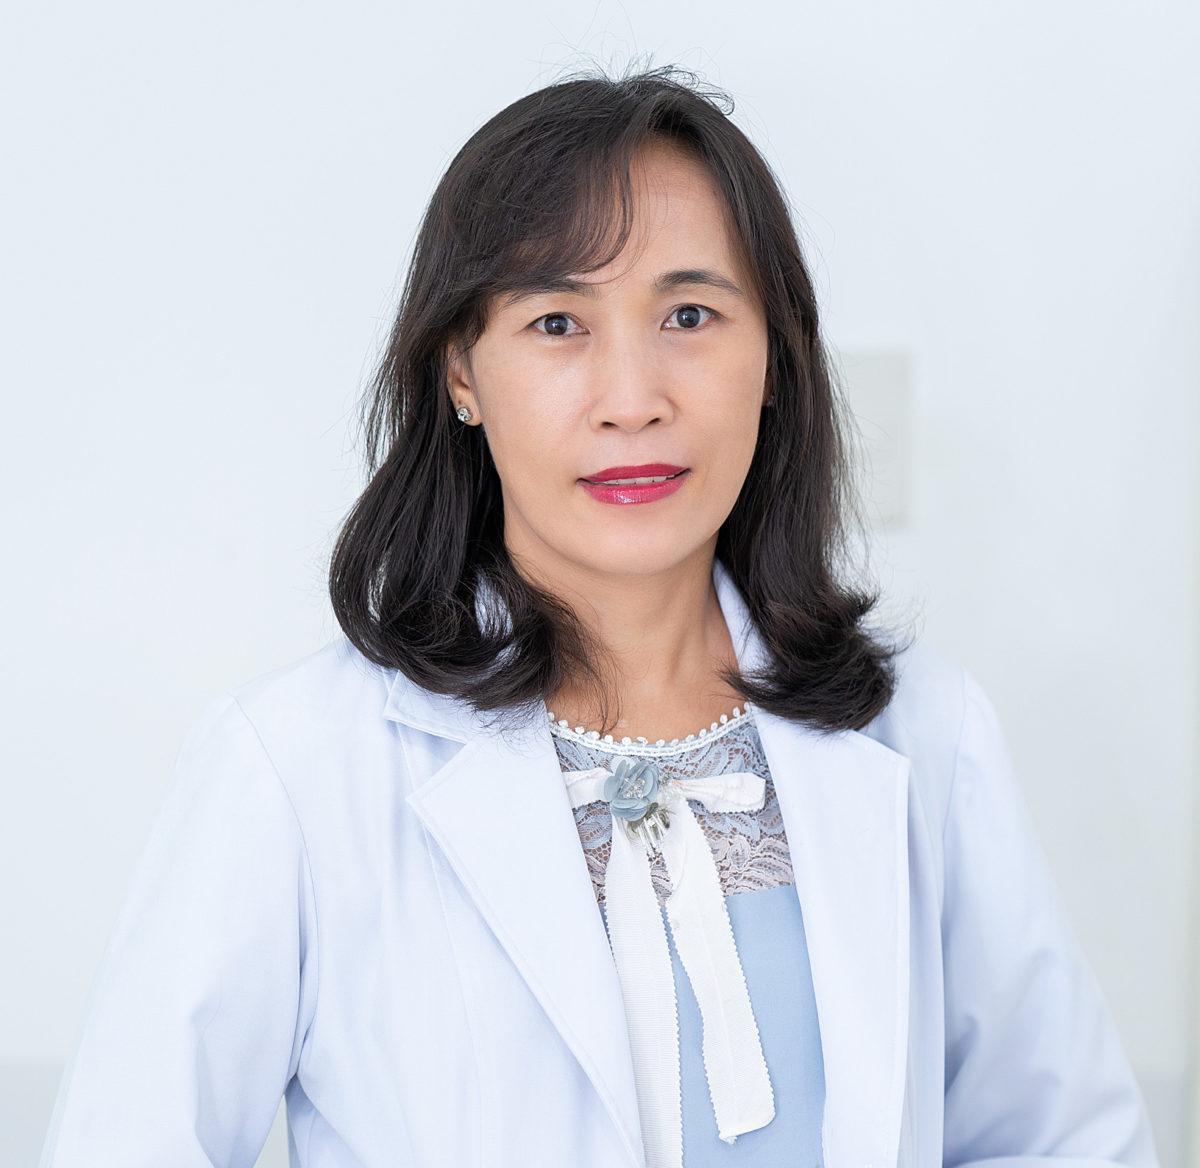 Bs CK1 Lầu Thị Kim Dung